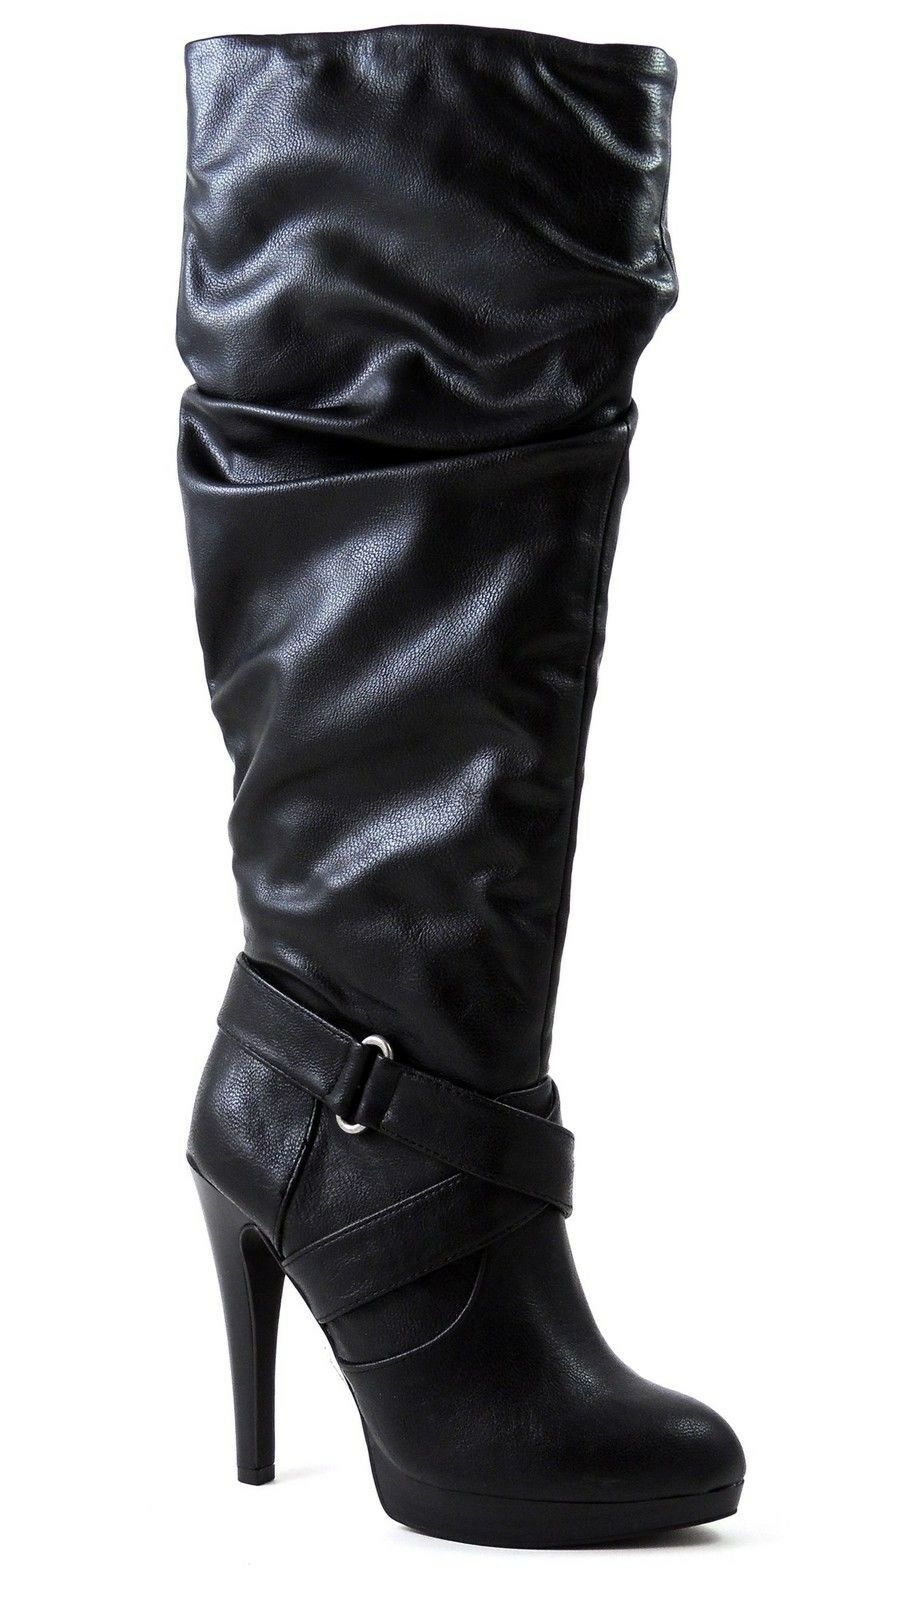 Inc International Concepts Women's Petra Knee High Slouchy Boots 5.5